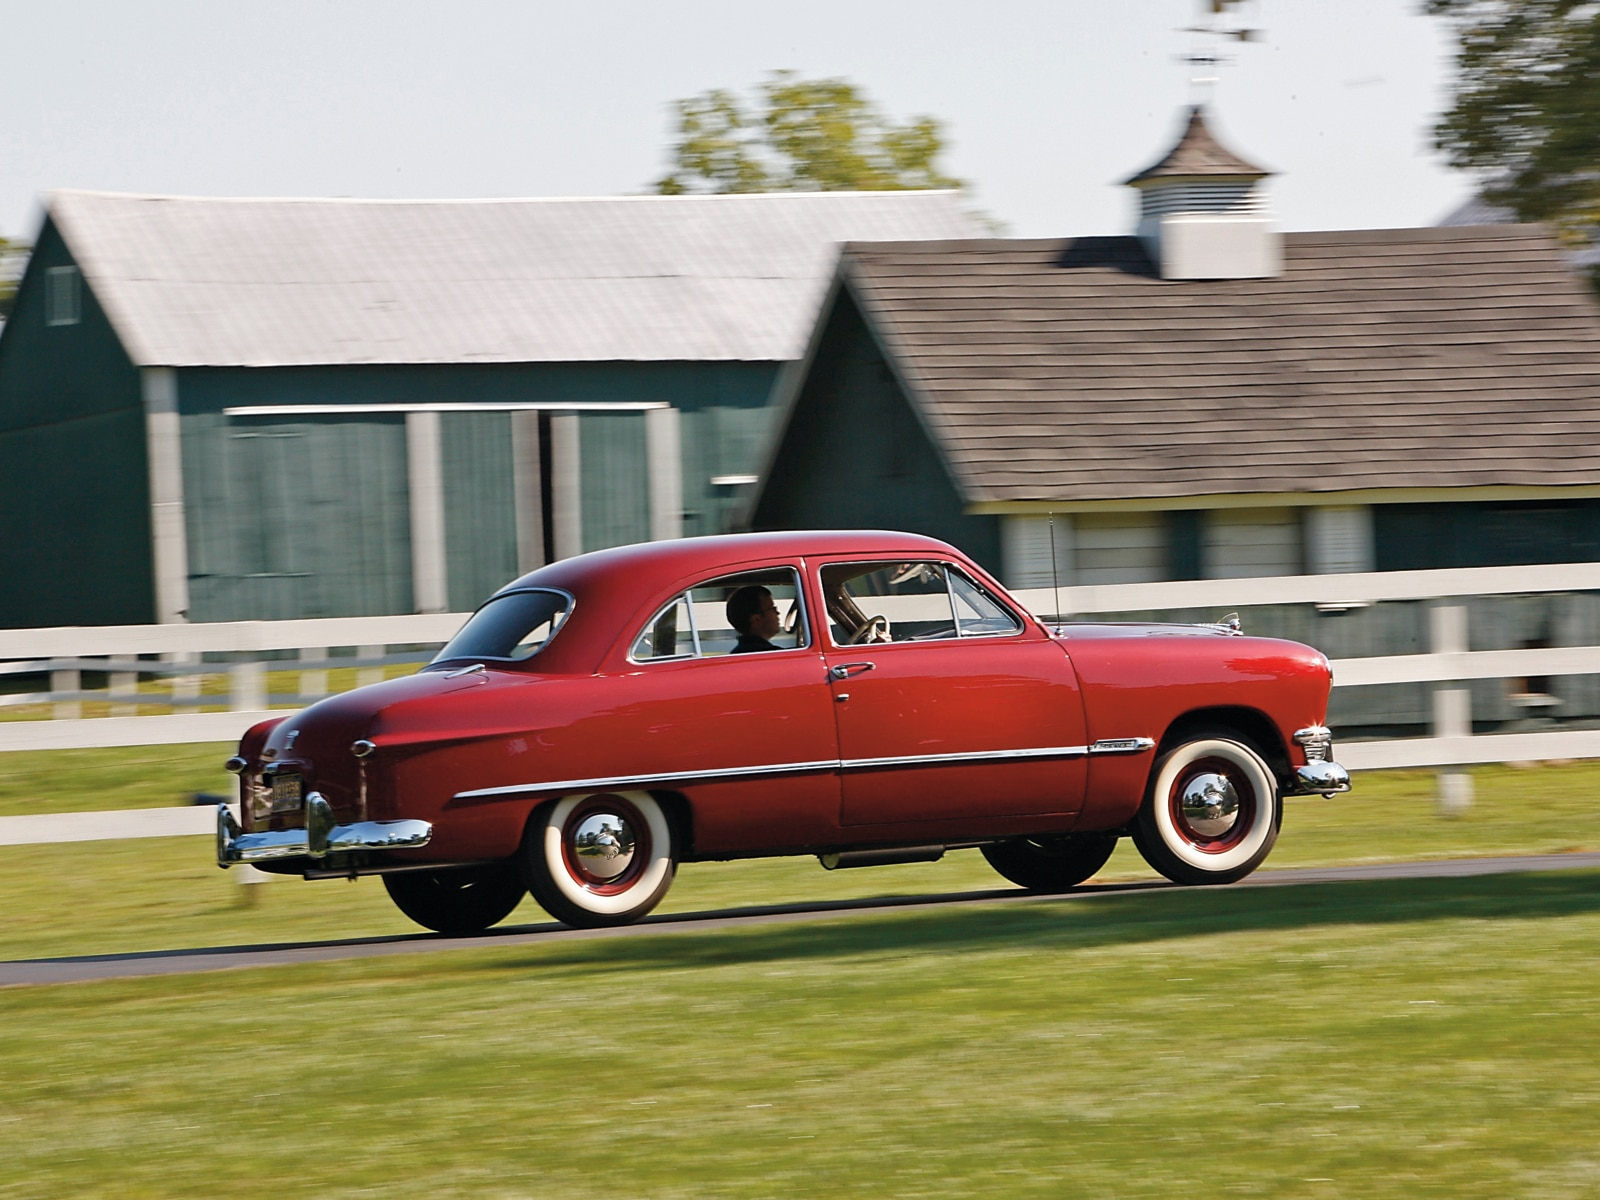 1|7 & 1949-1951 Ford - 1950 Ford Tudor Sedan Collectible Classic Cars ... markmcfarlin.com